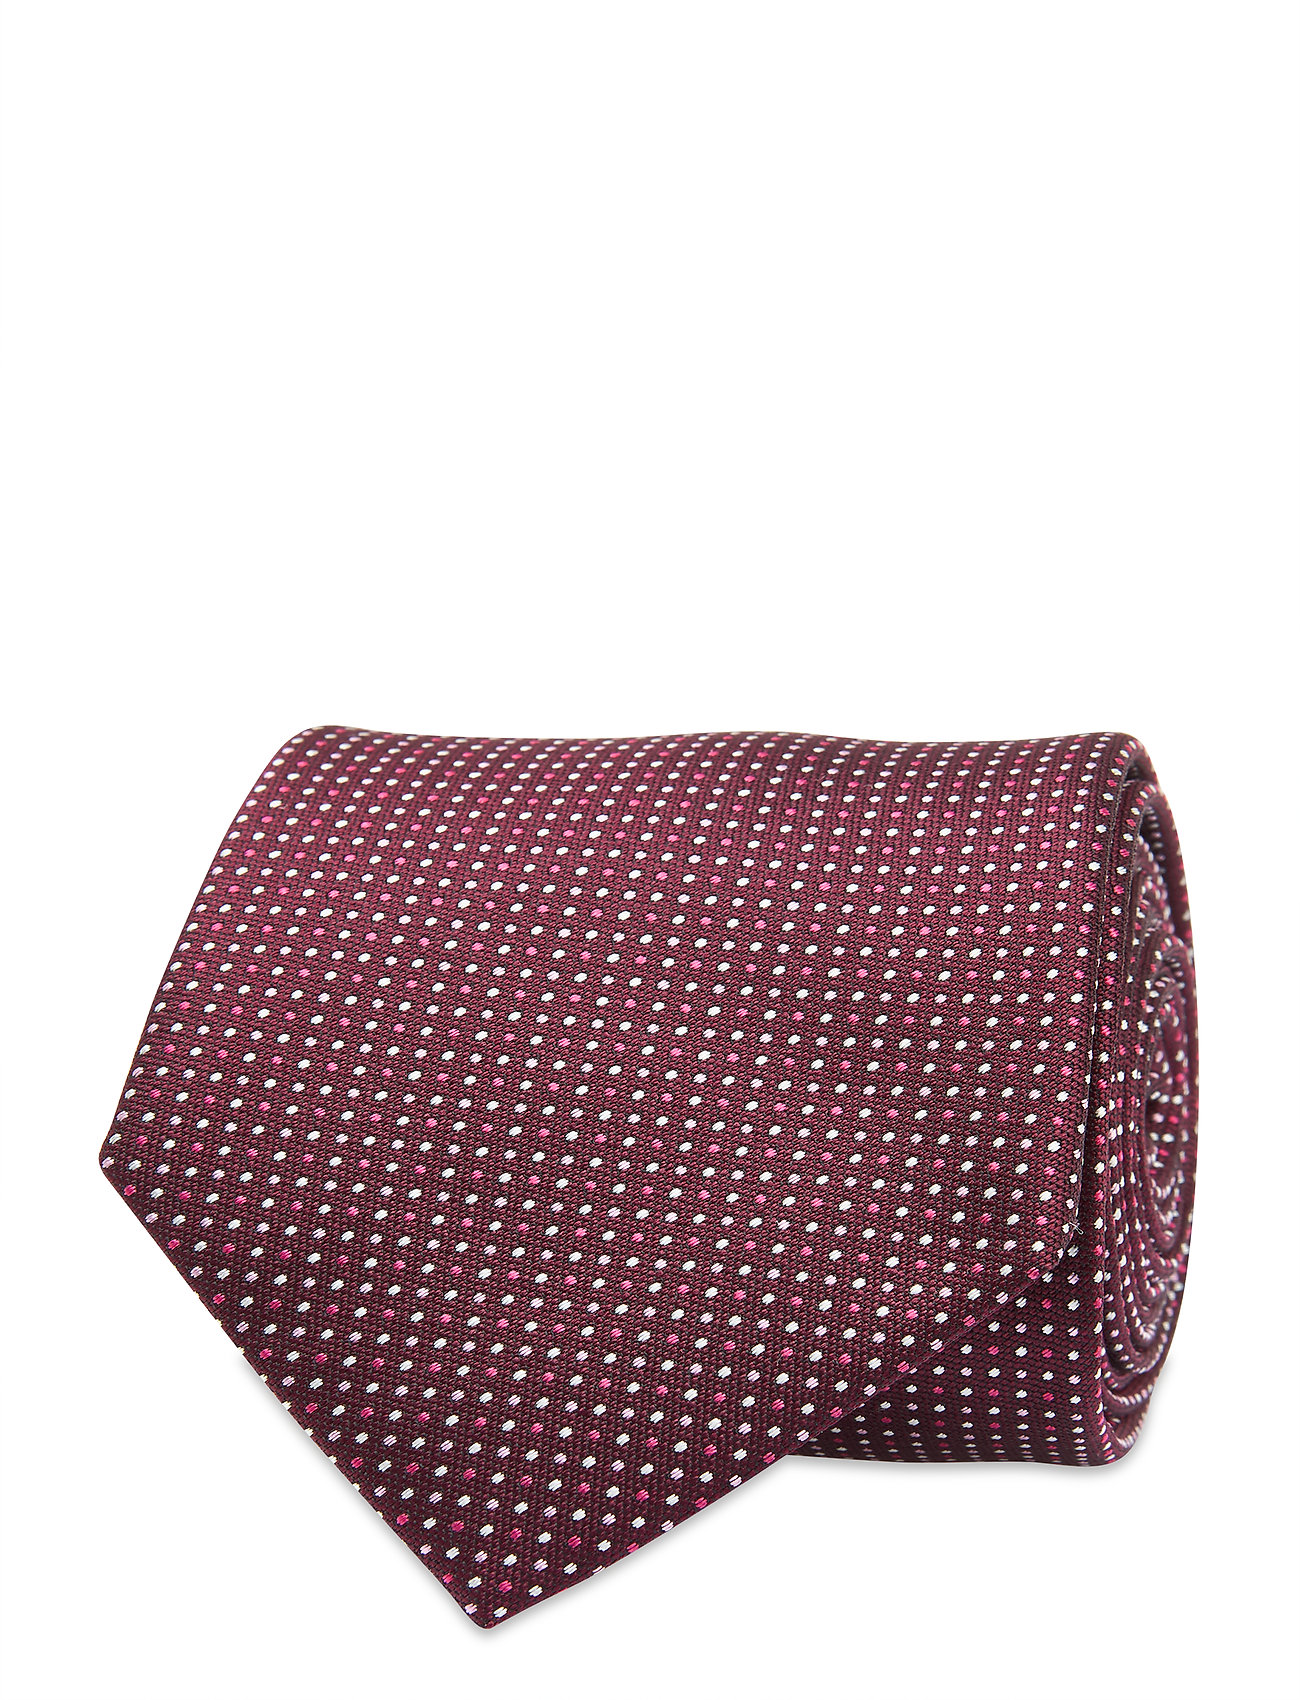 Image of Tie 7,5 Cm Slips Rød BOSS (3467806623)